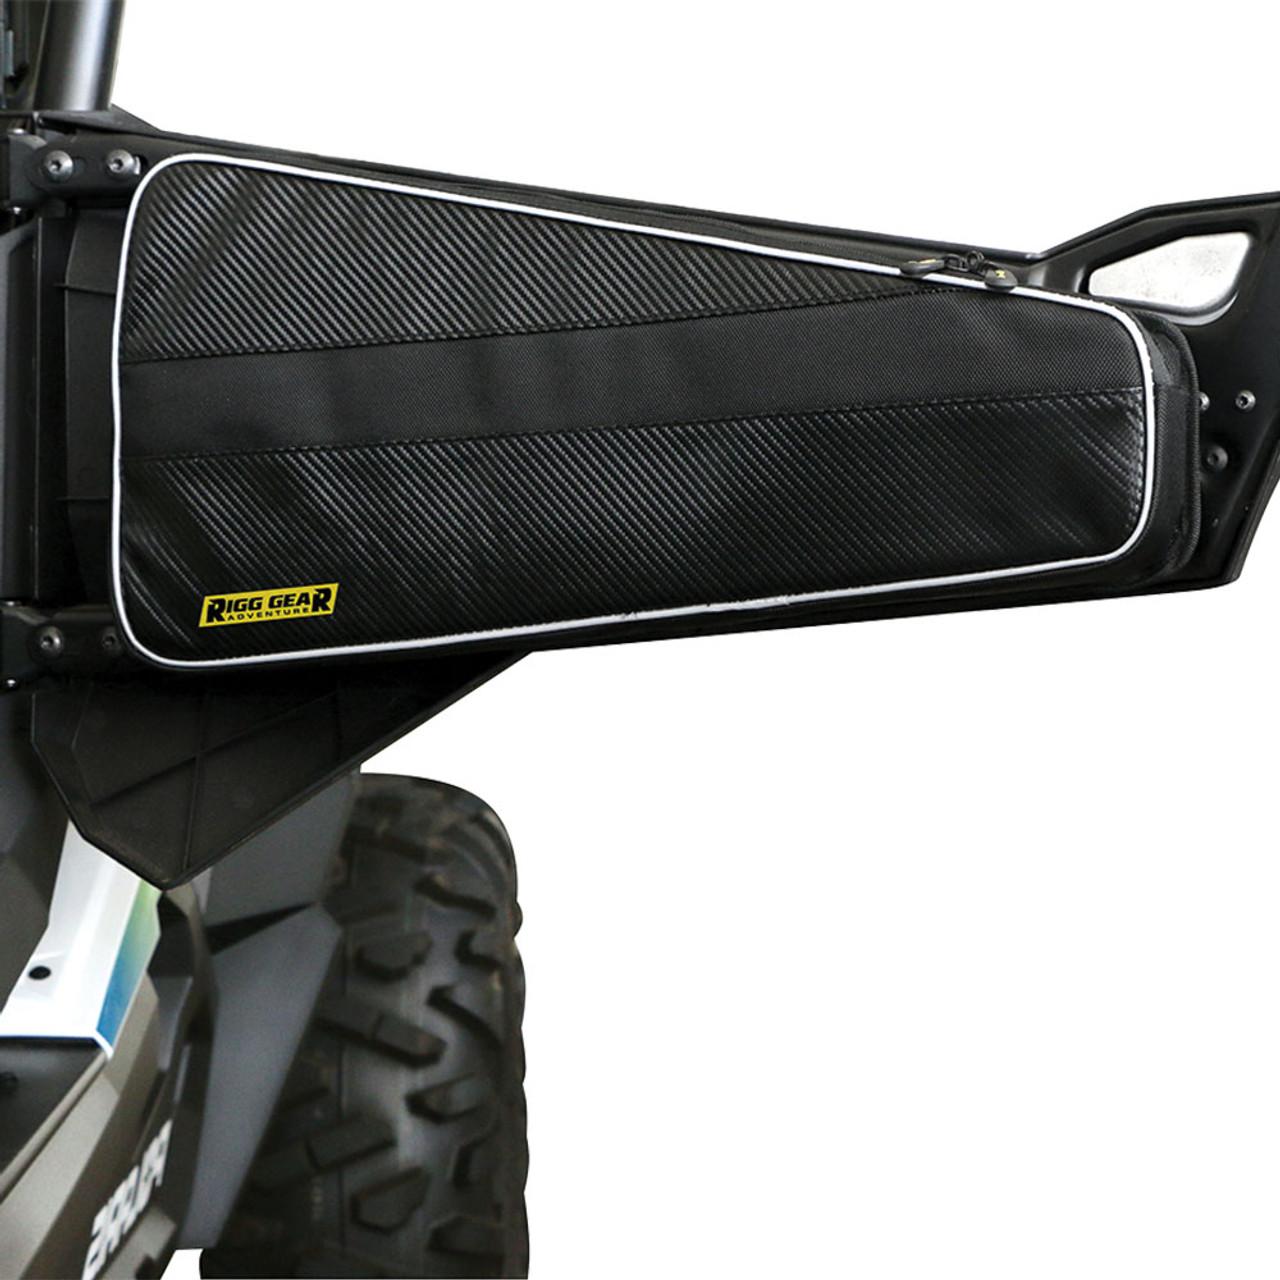 Nelson-Rigg ATV Bag RG-001L RZR Front Lower Door Bag Set